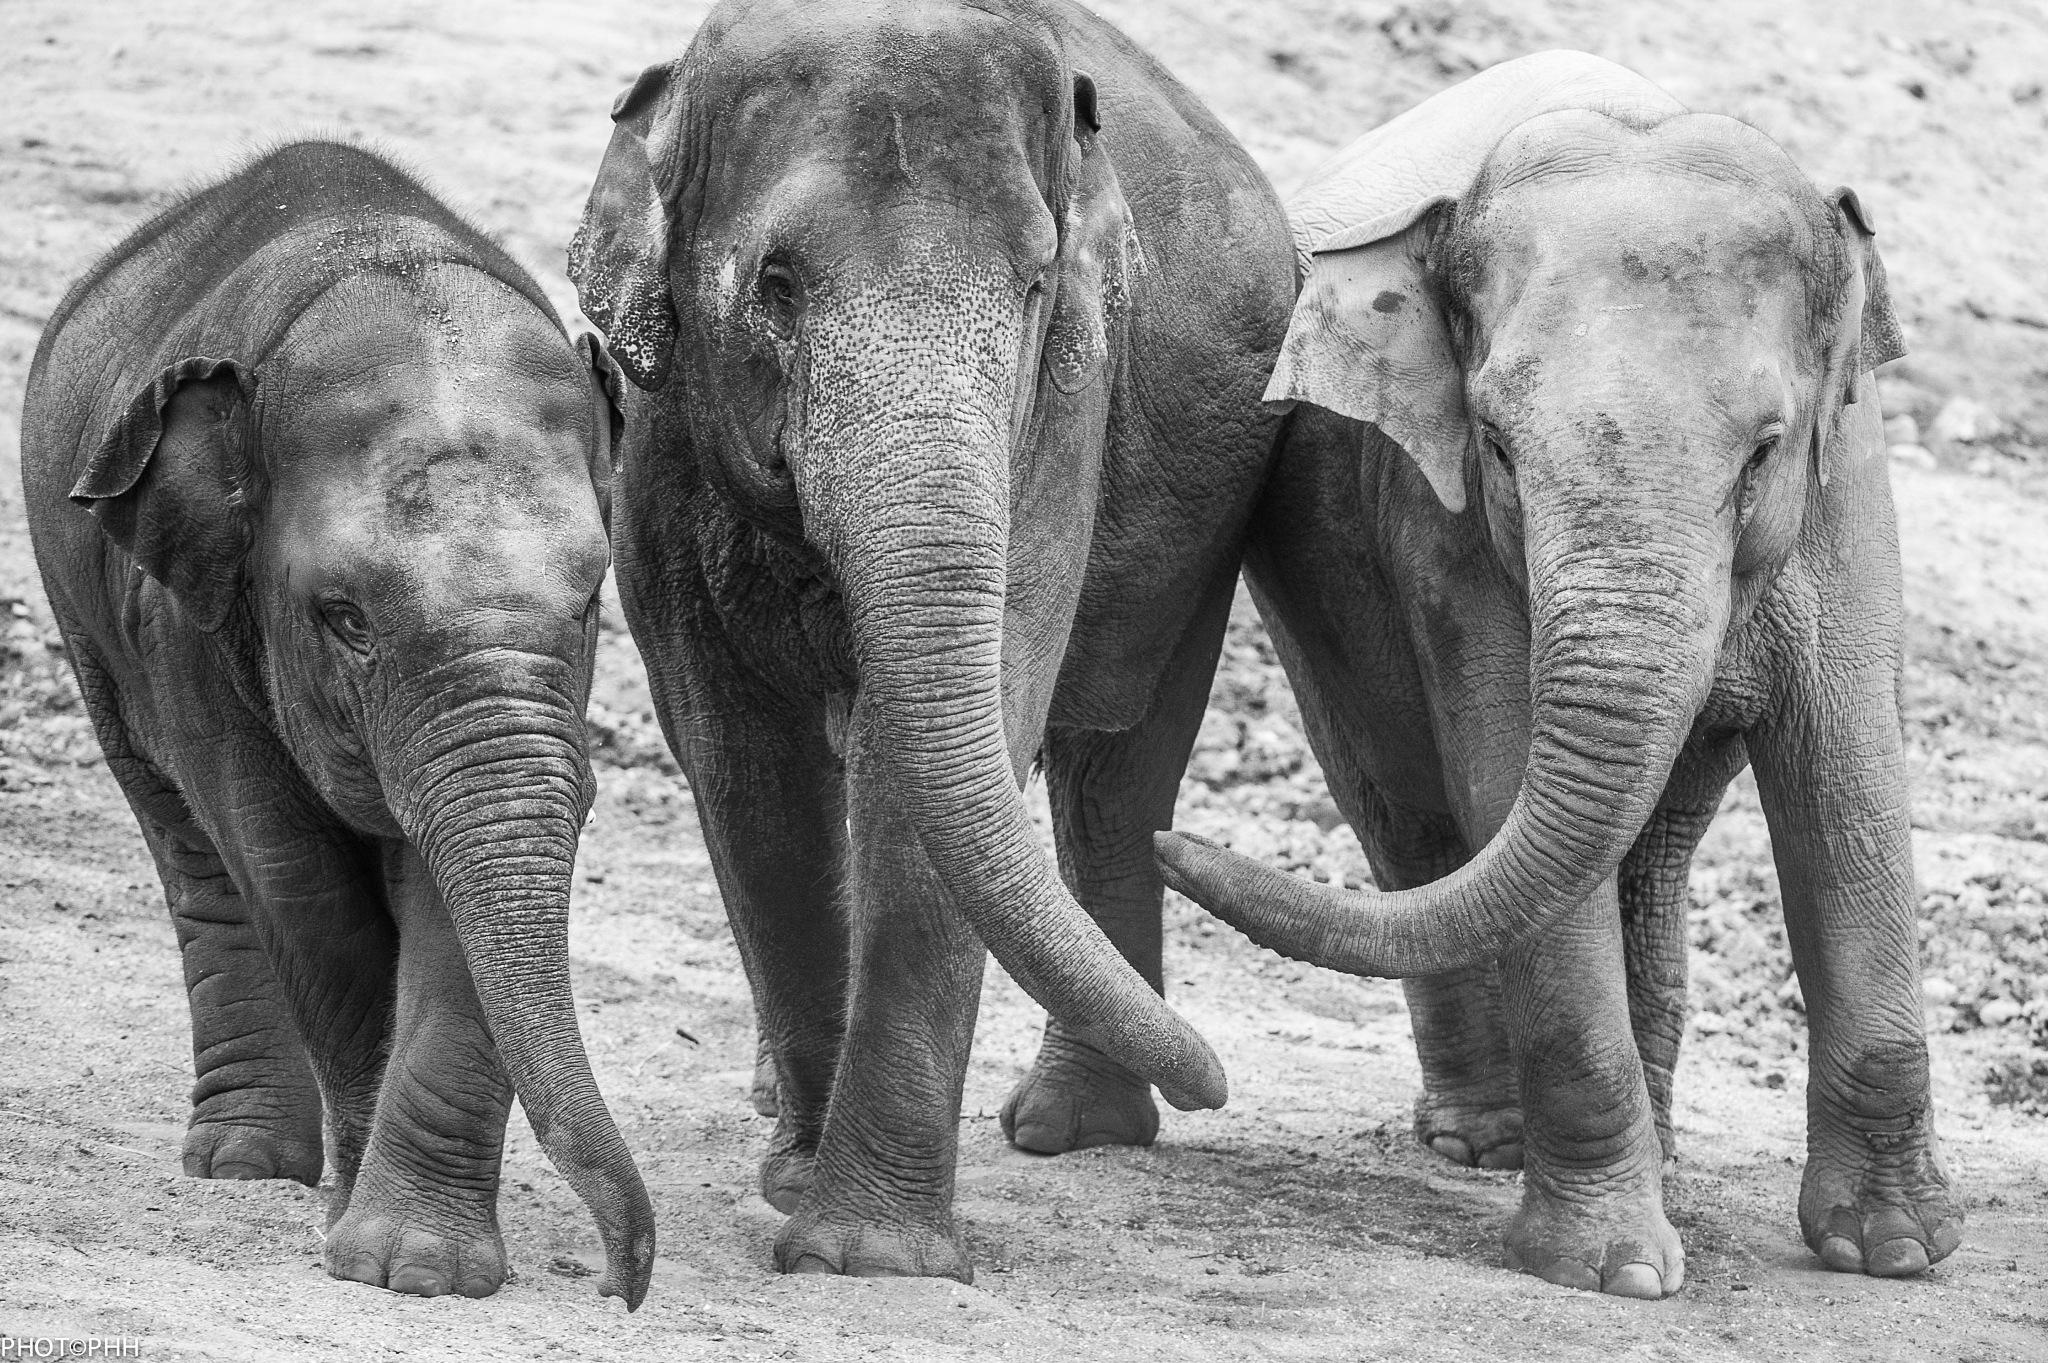 Elephants by PHOTOPHH.1